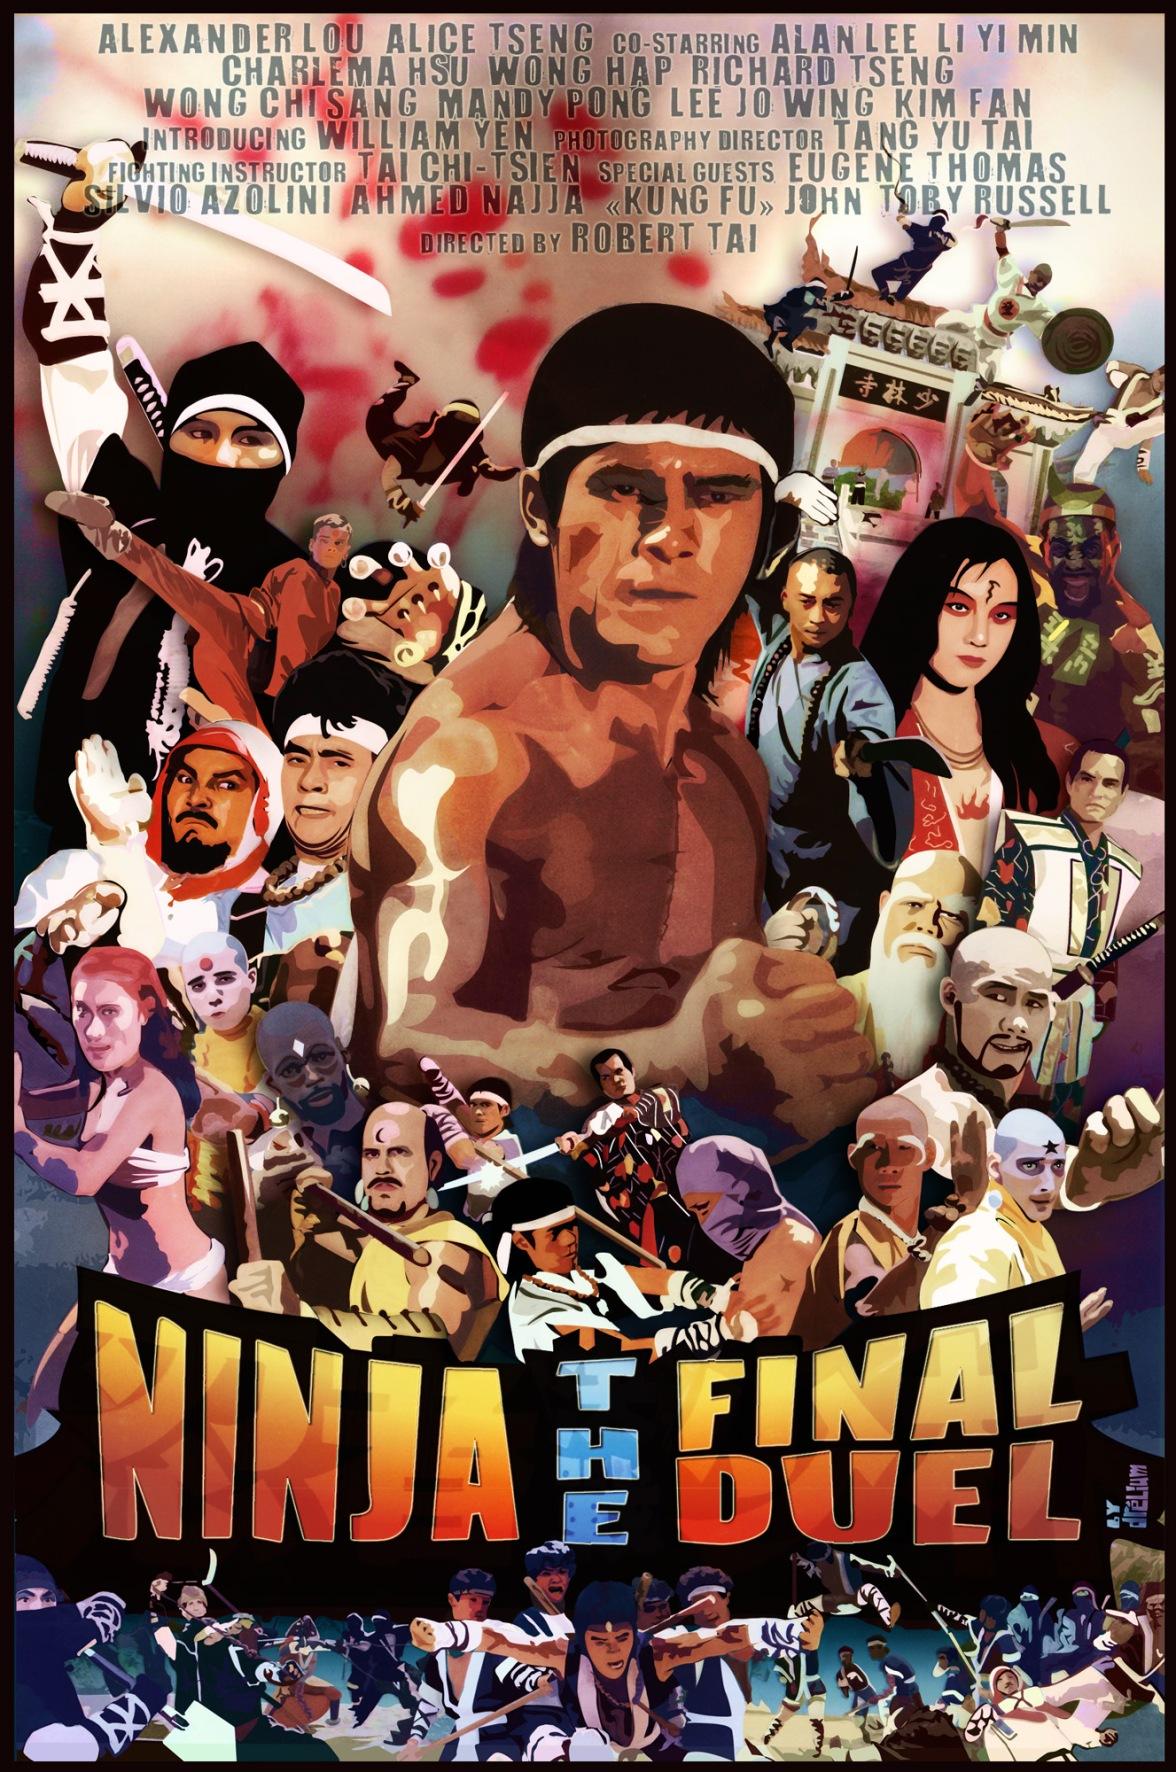 Ninja, the final duel